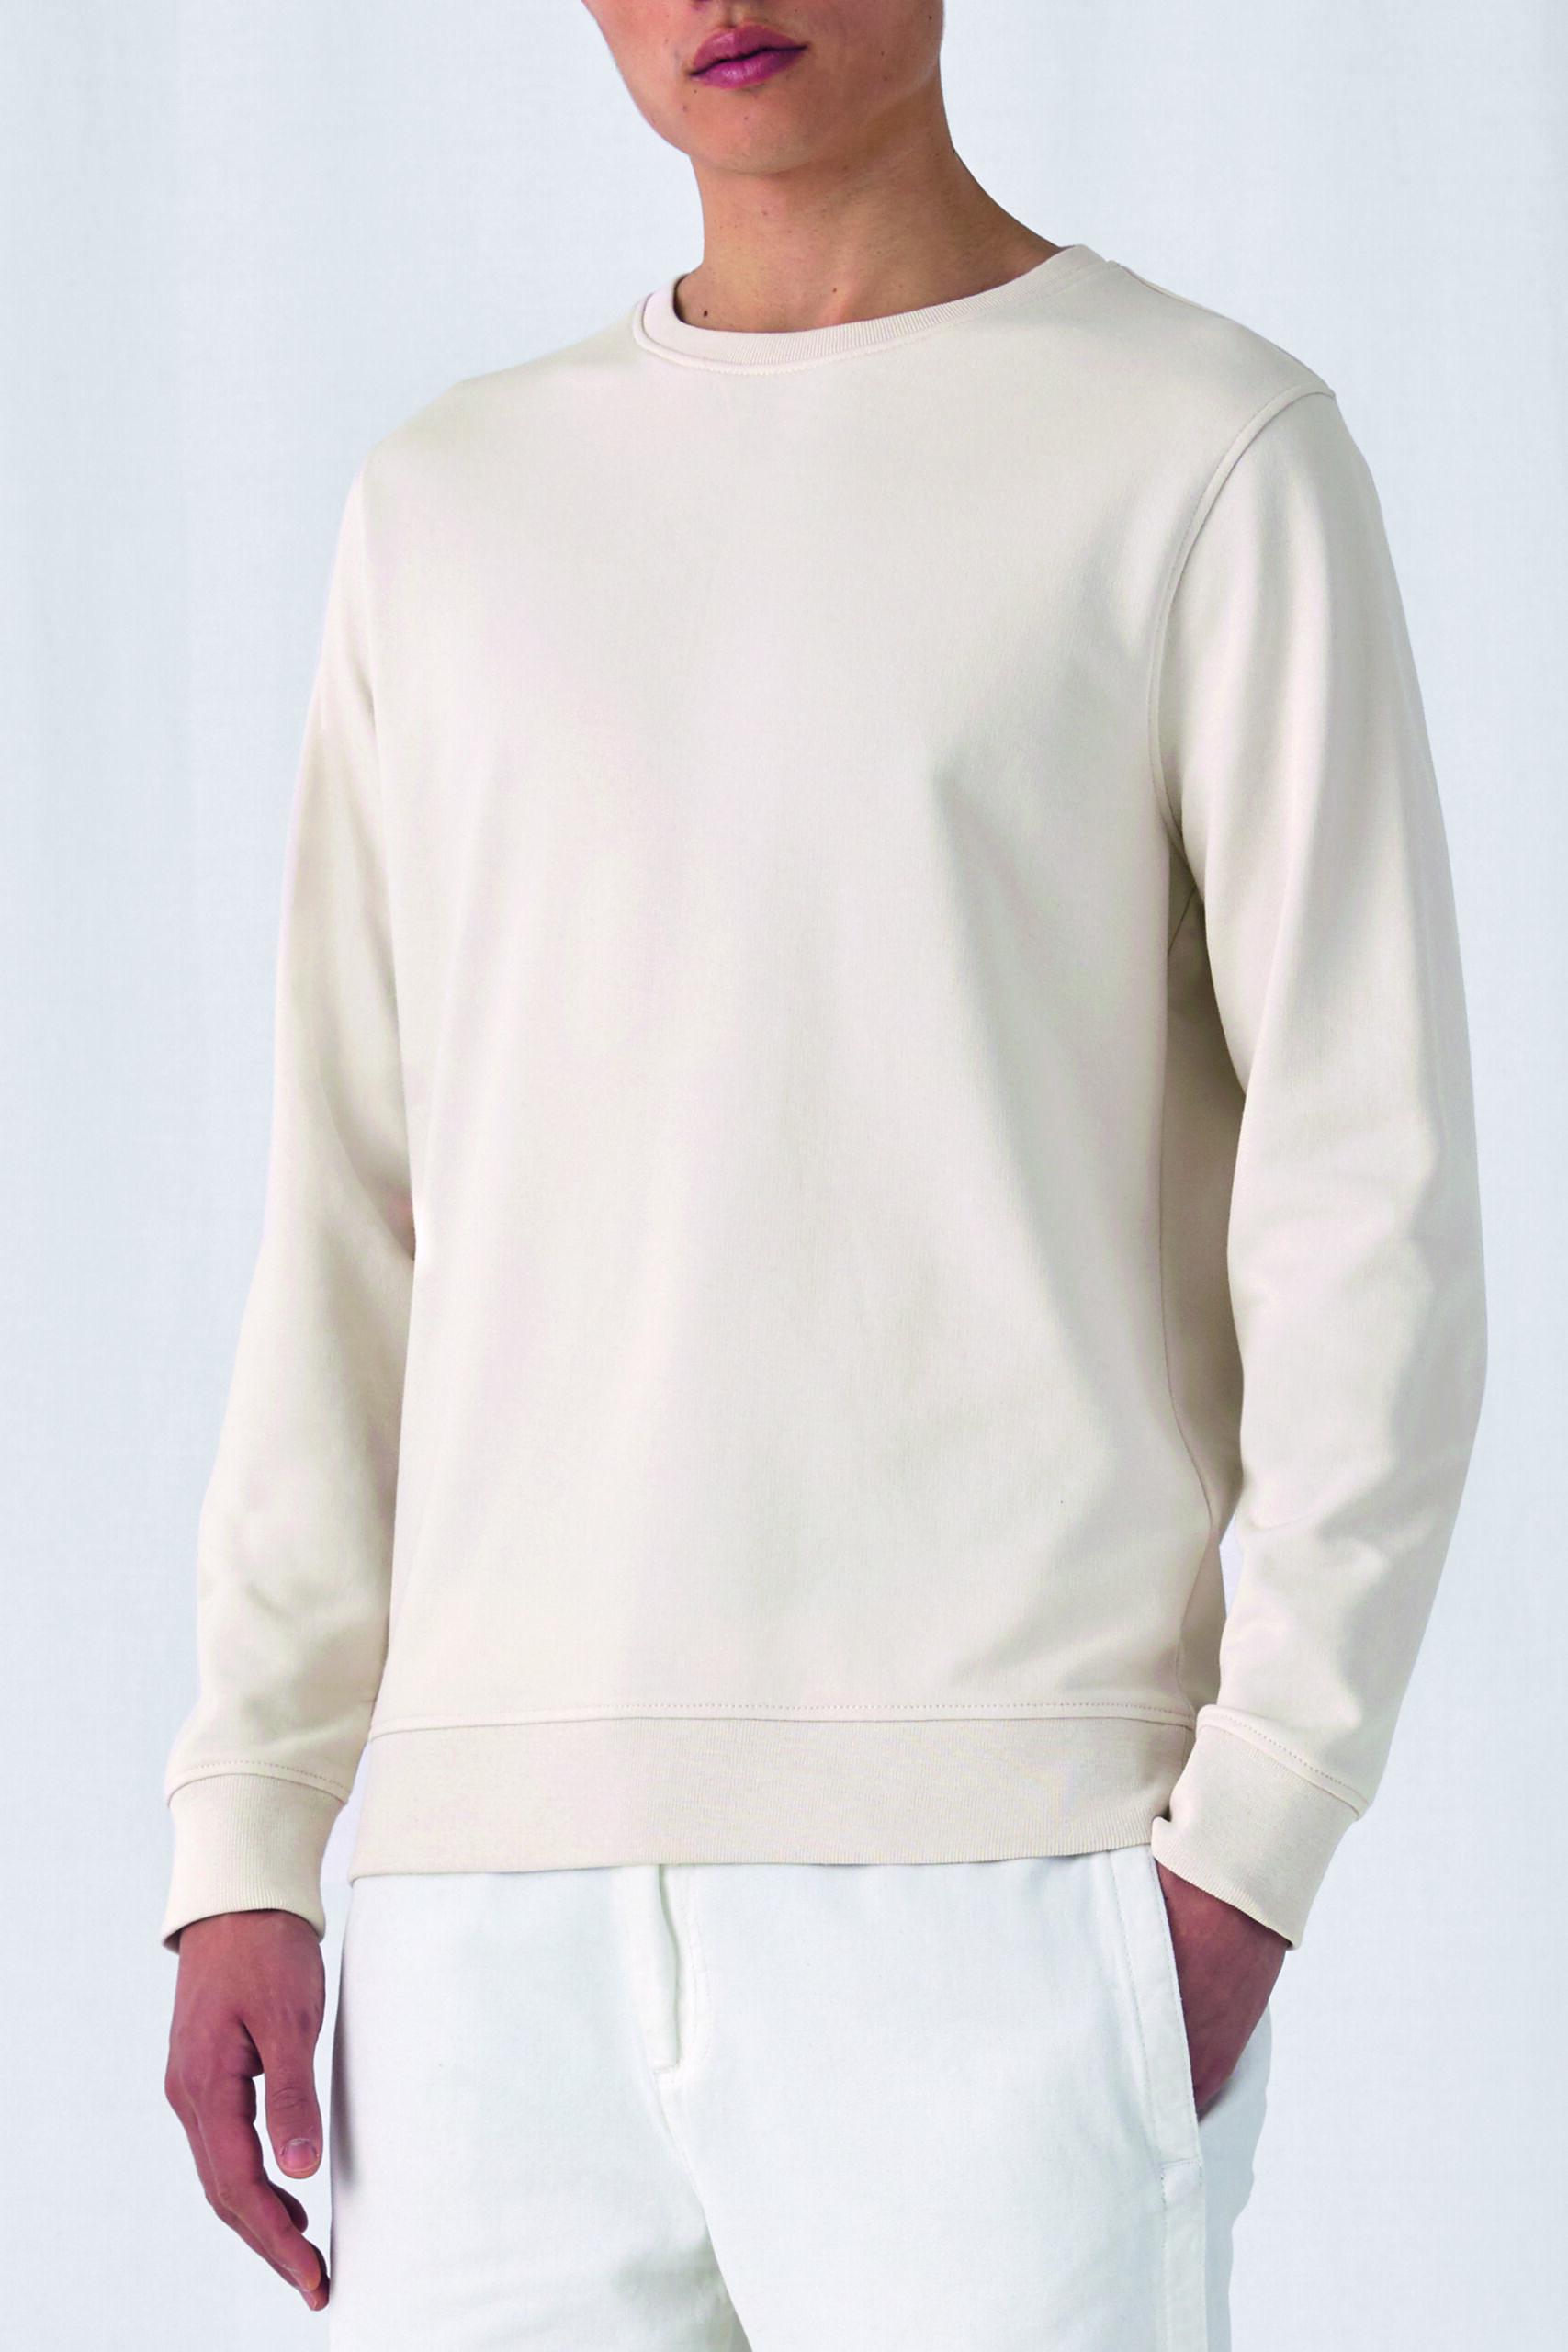 Økologisk Unisex Sweatshirt I En 280g/m2 Kvalitet [BCWU31B]